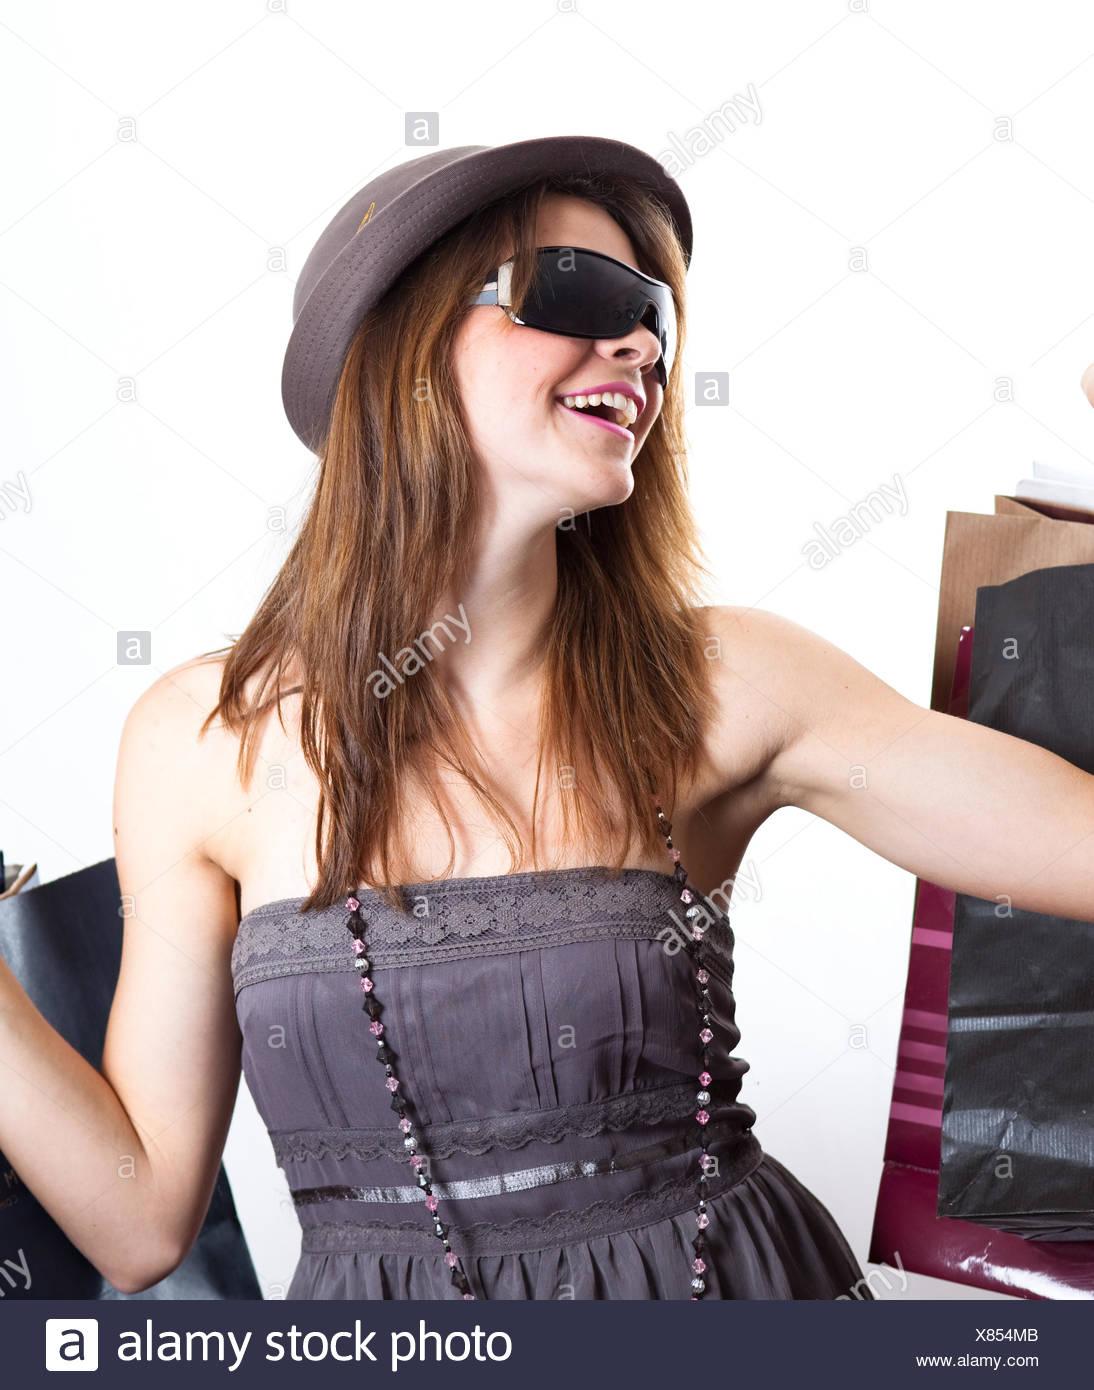 woman shopping consumer - Stock Image